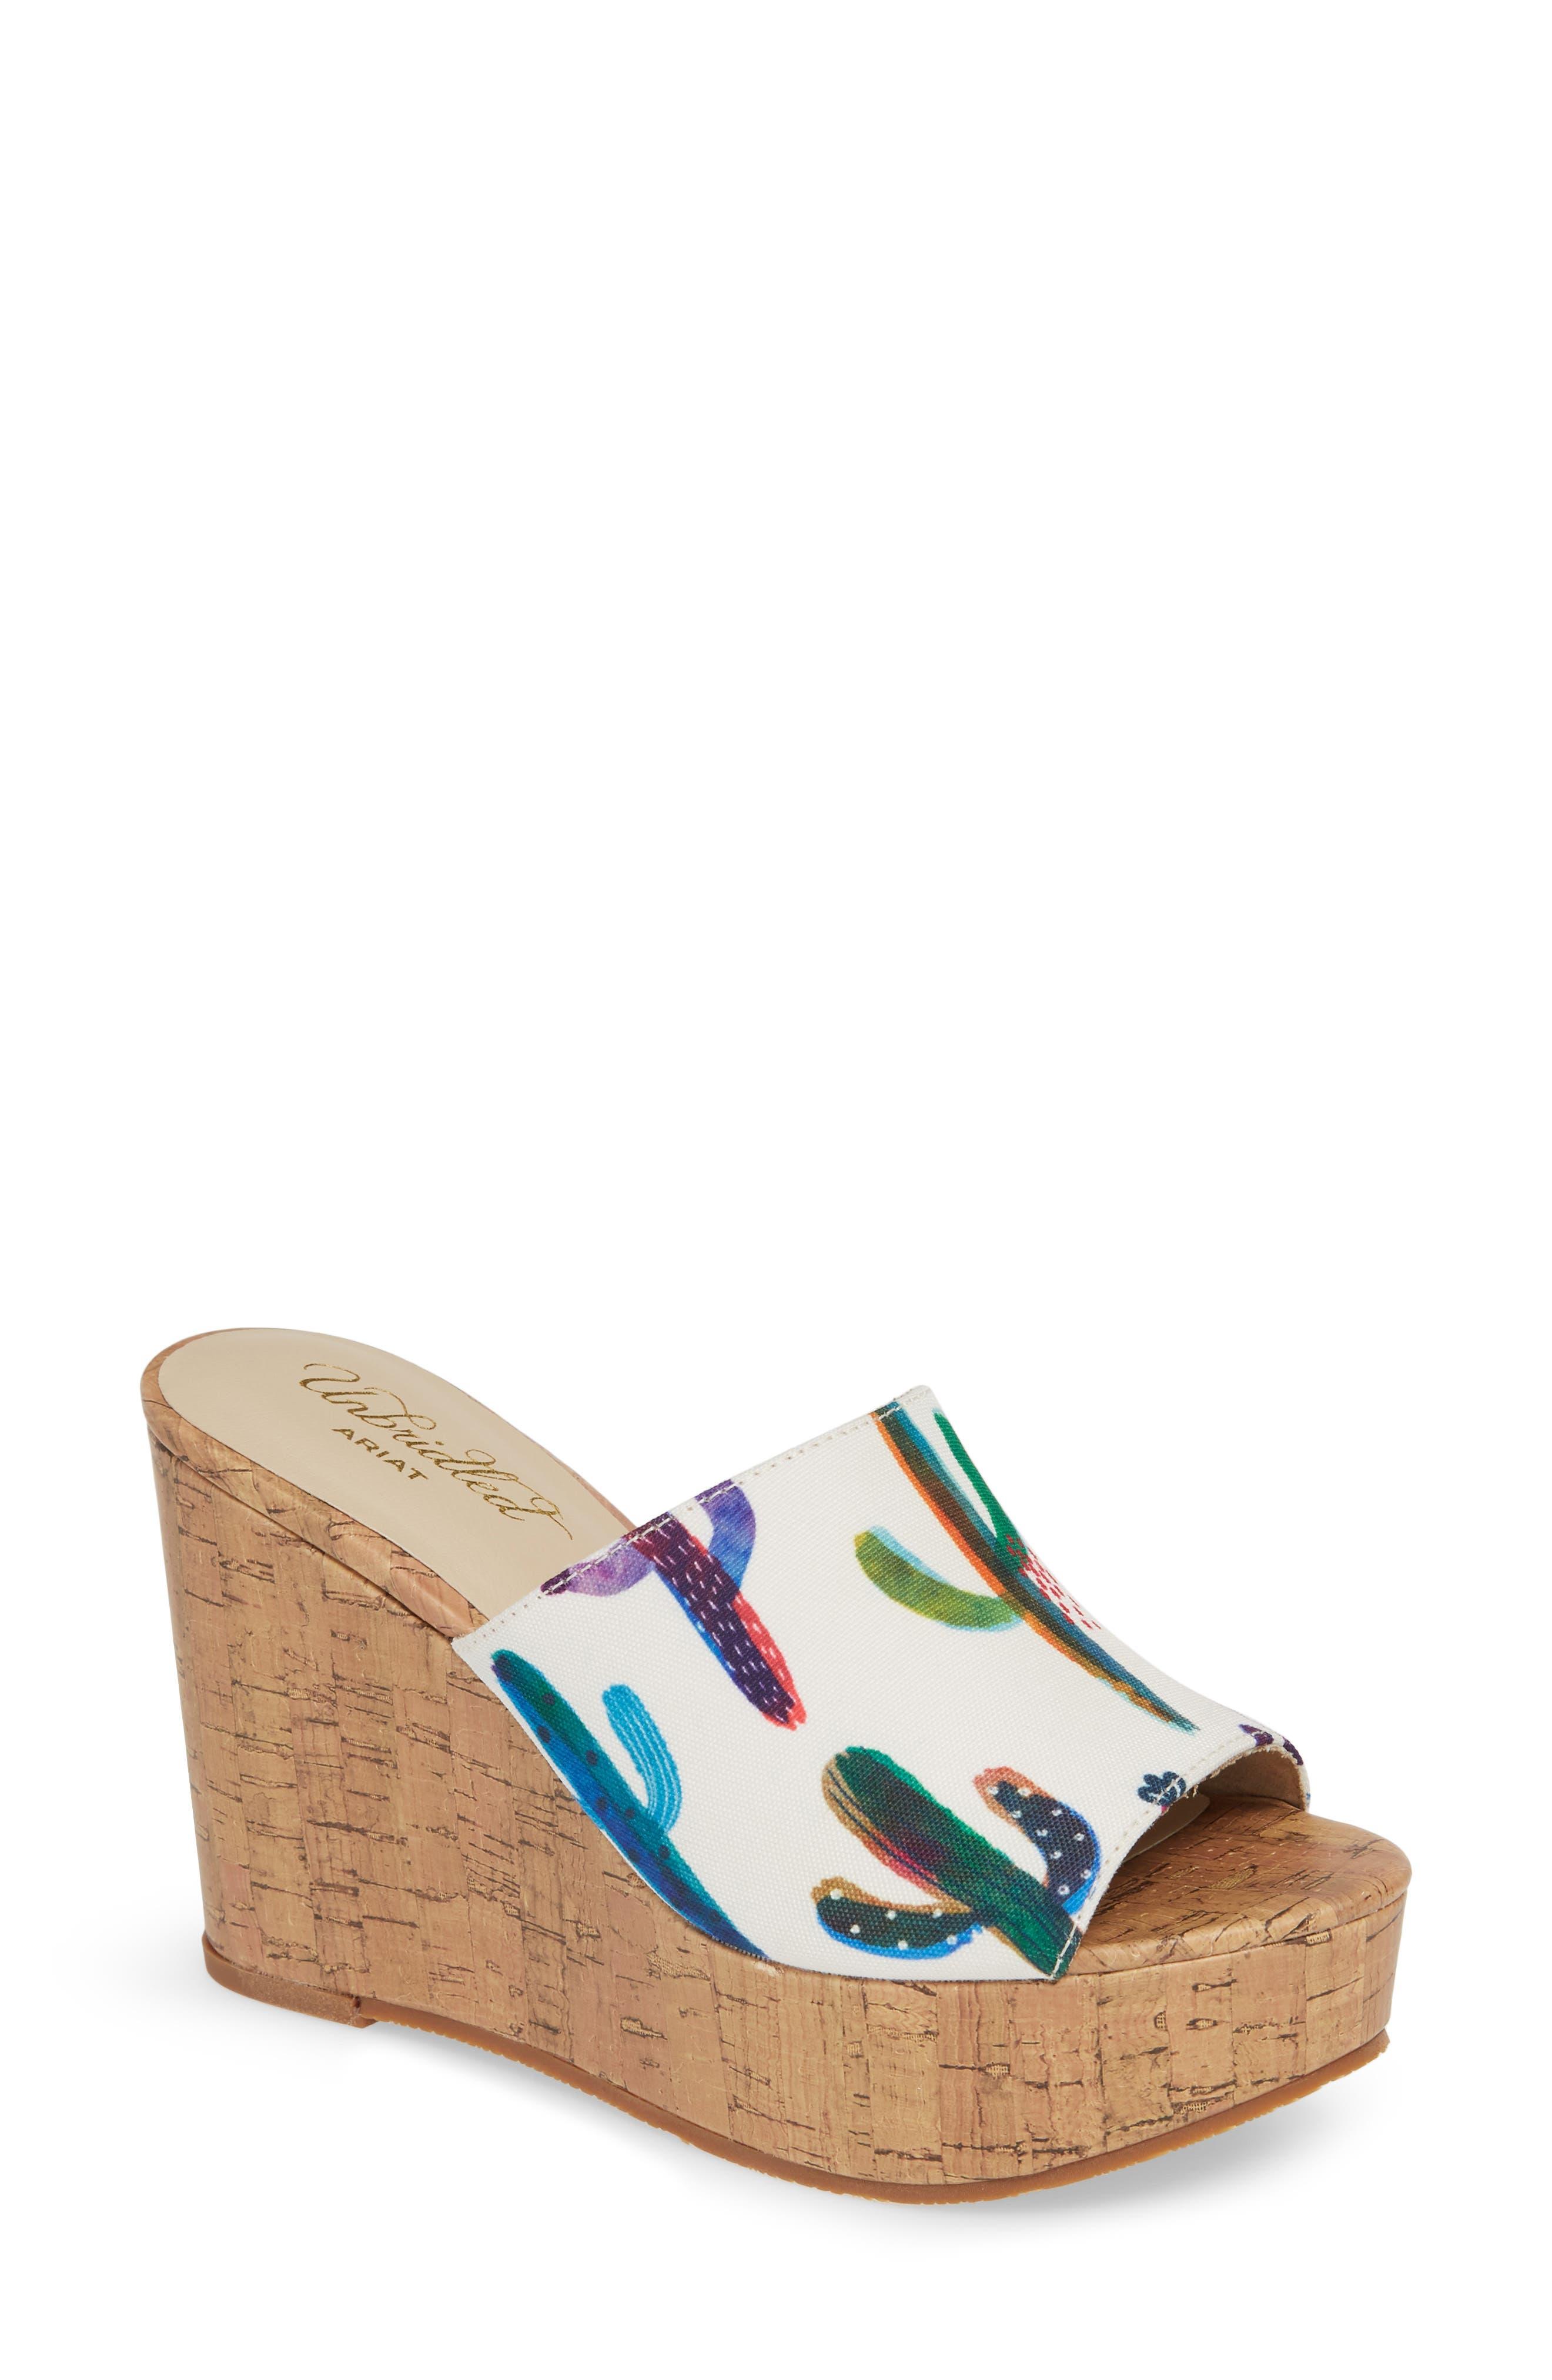 ARIAT Layla Wedge Slide Sandal, Main, color, CACTUS PRINT FABRIC